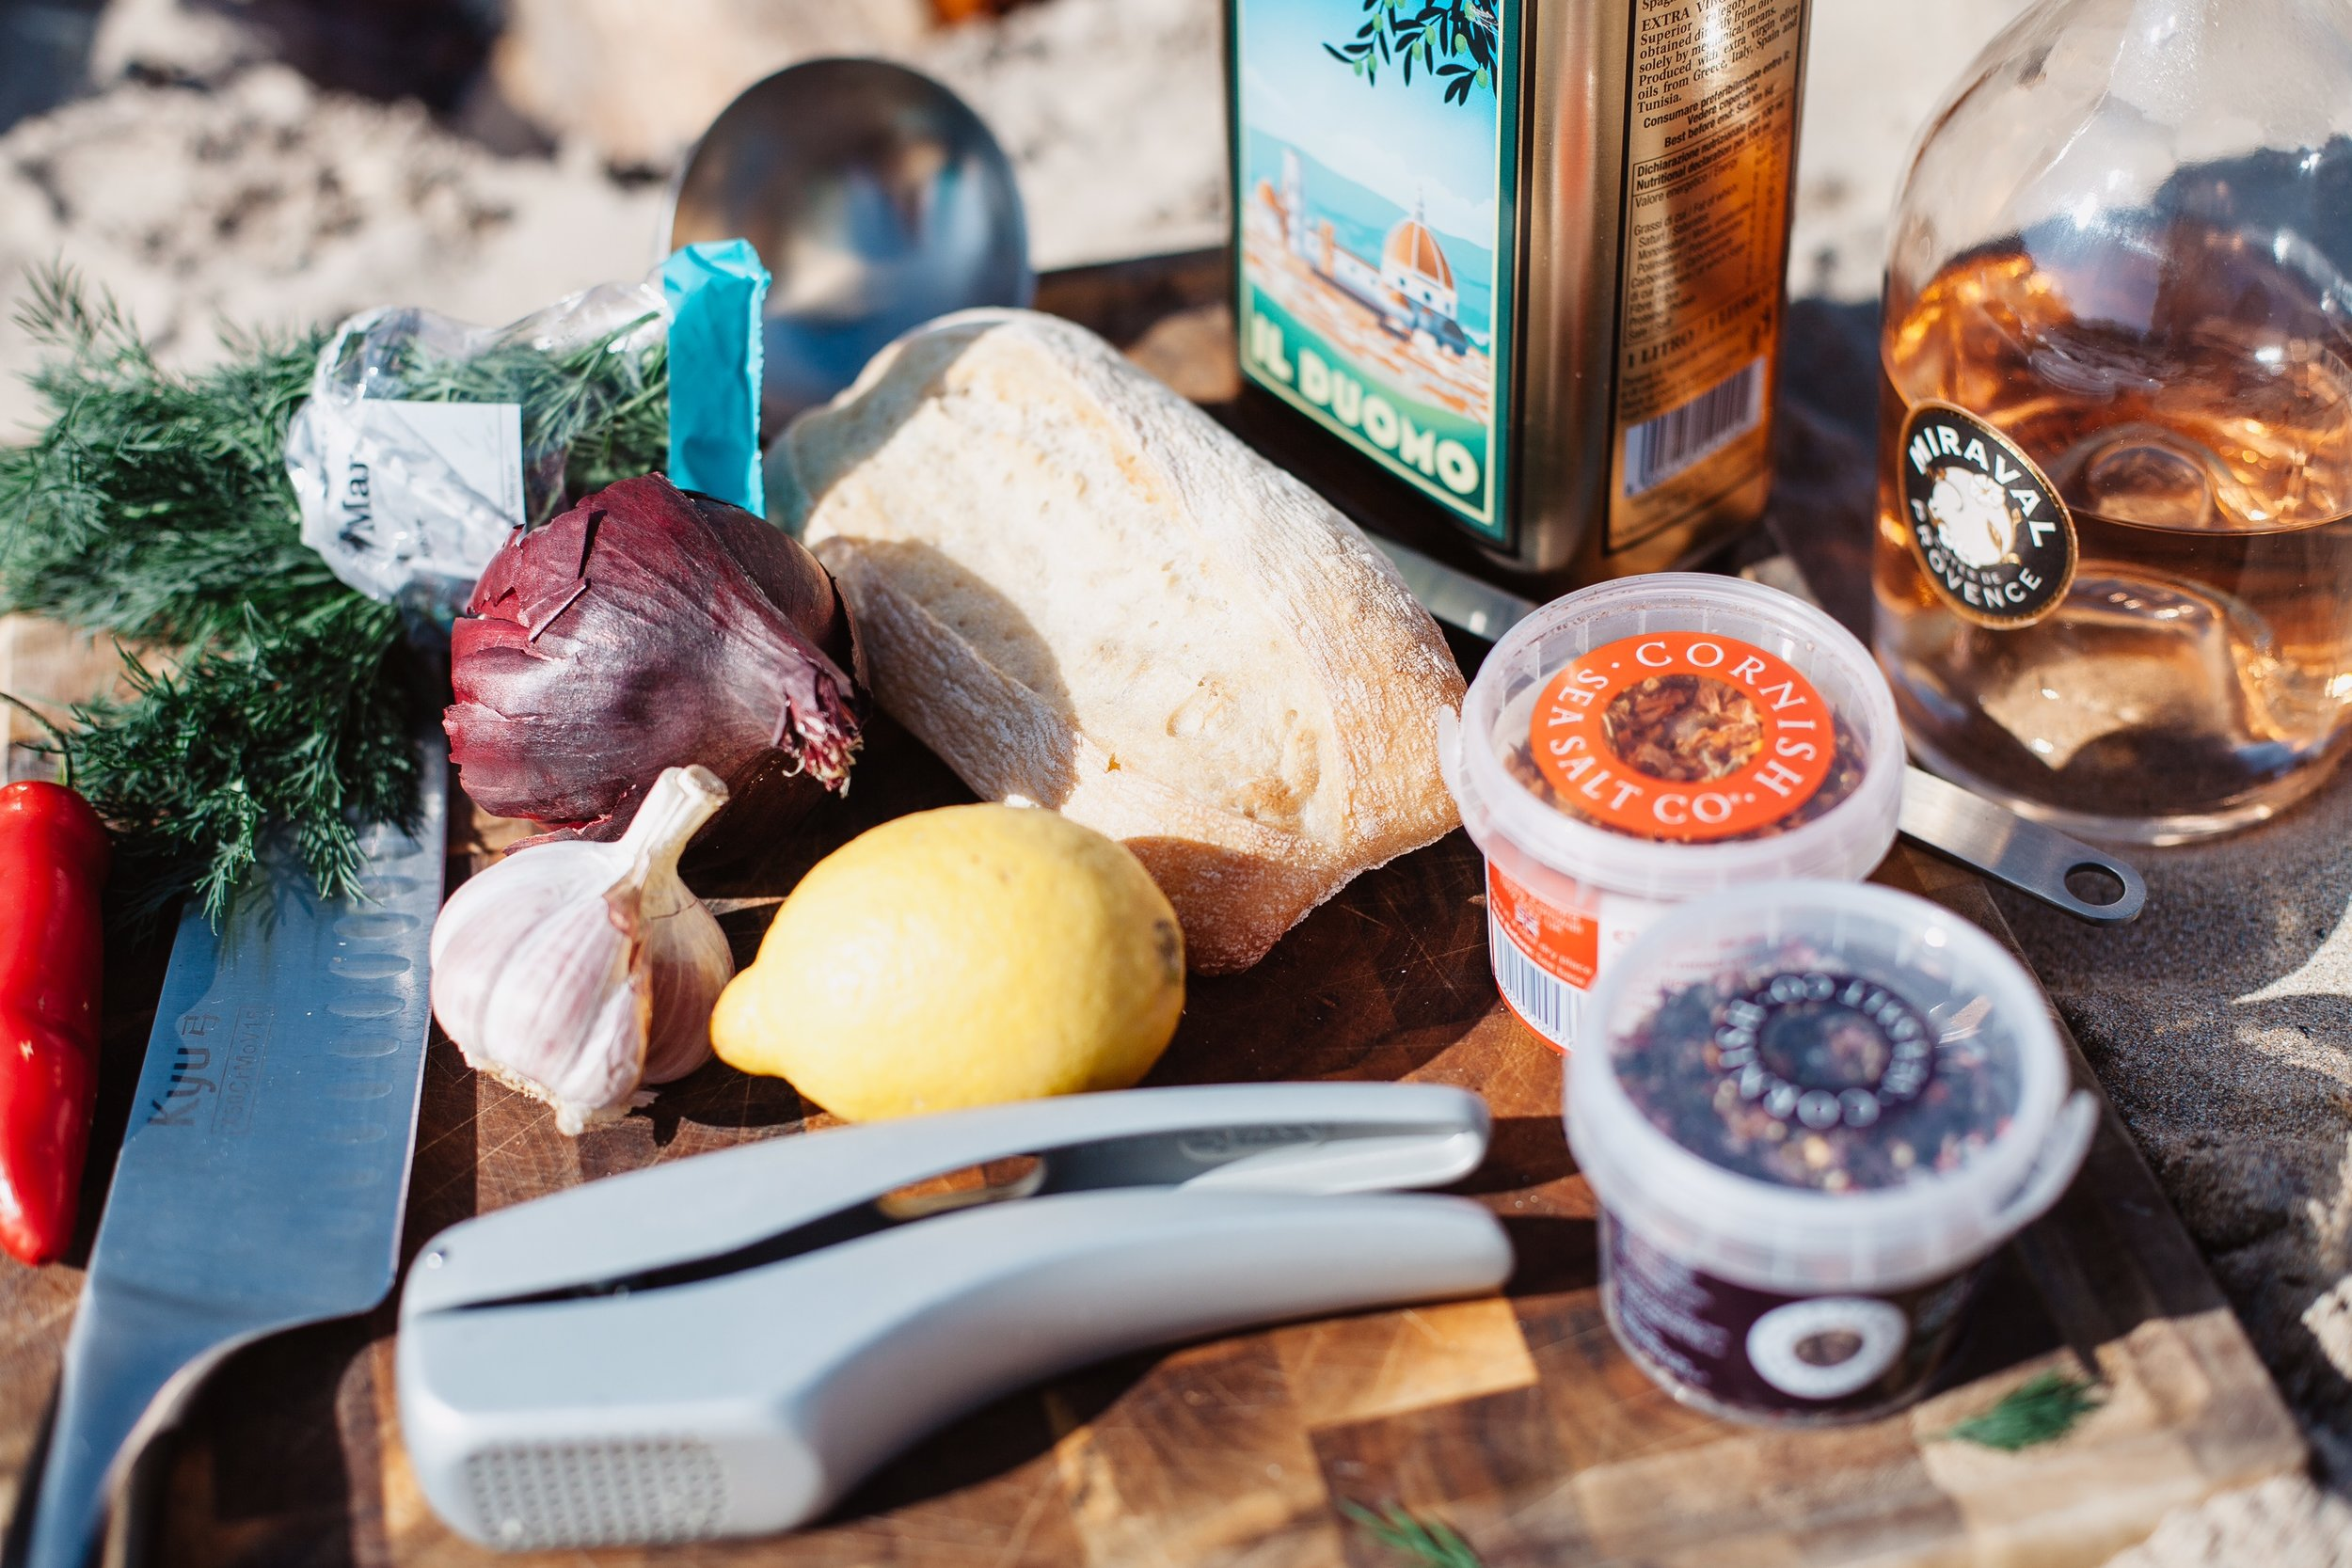 ingrediants.JPG